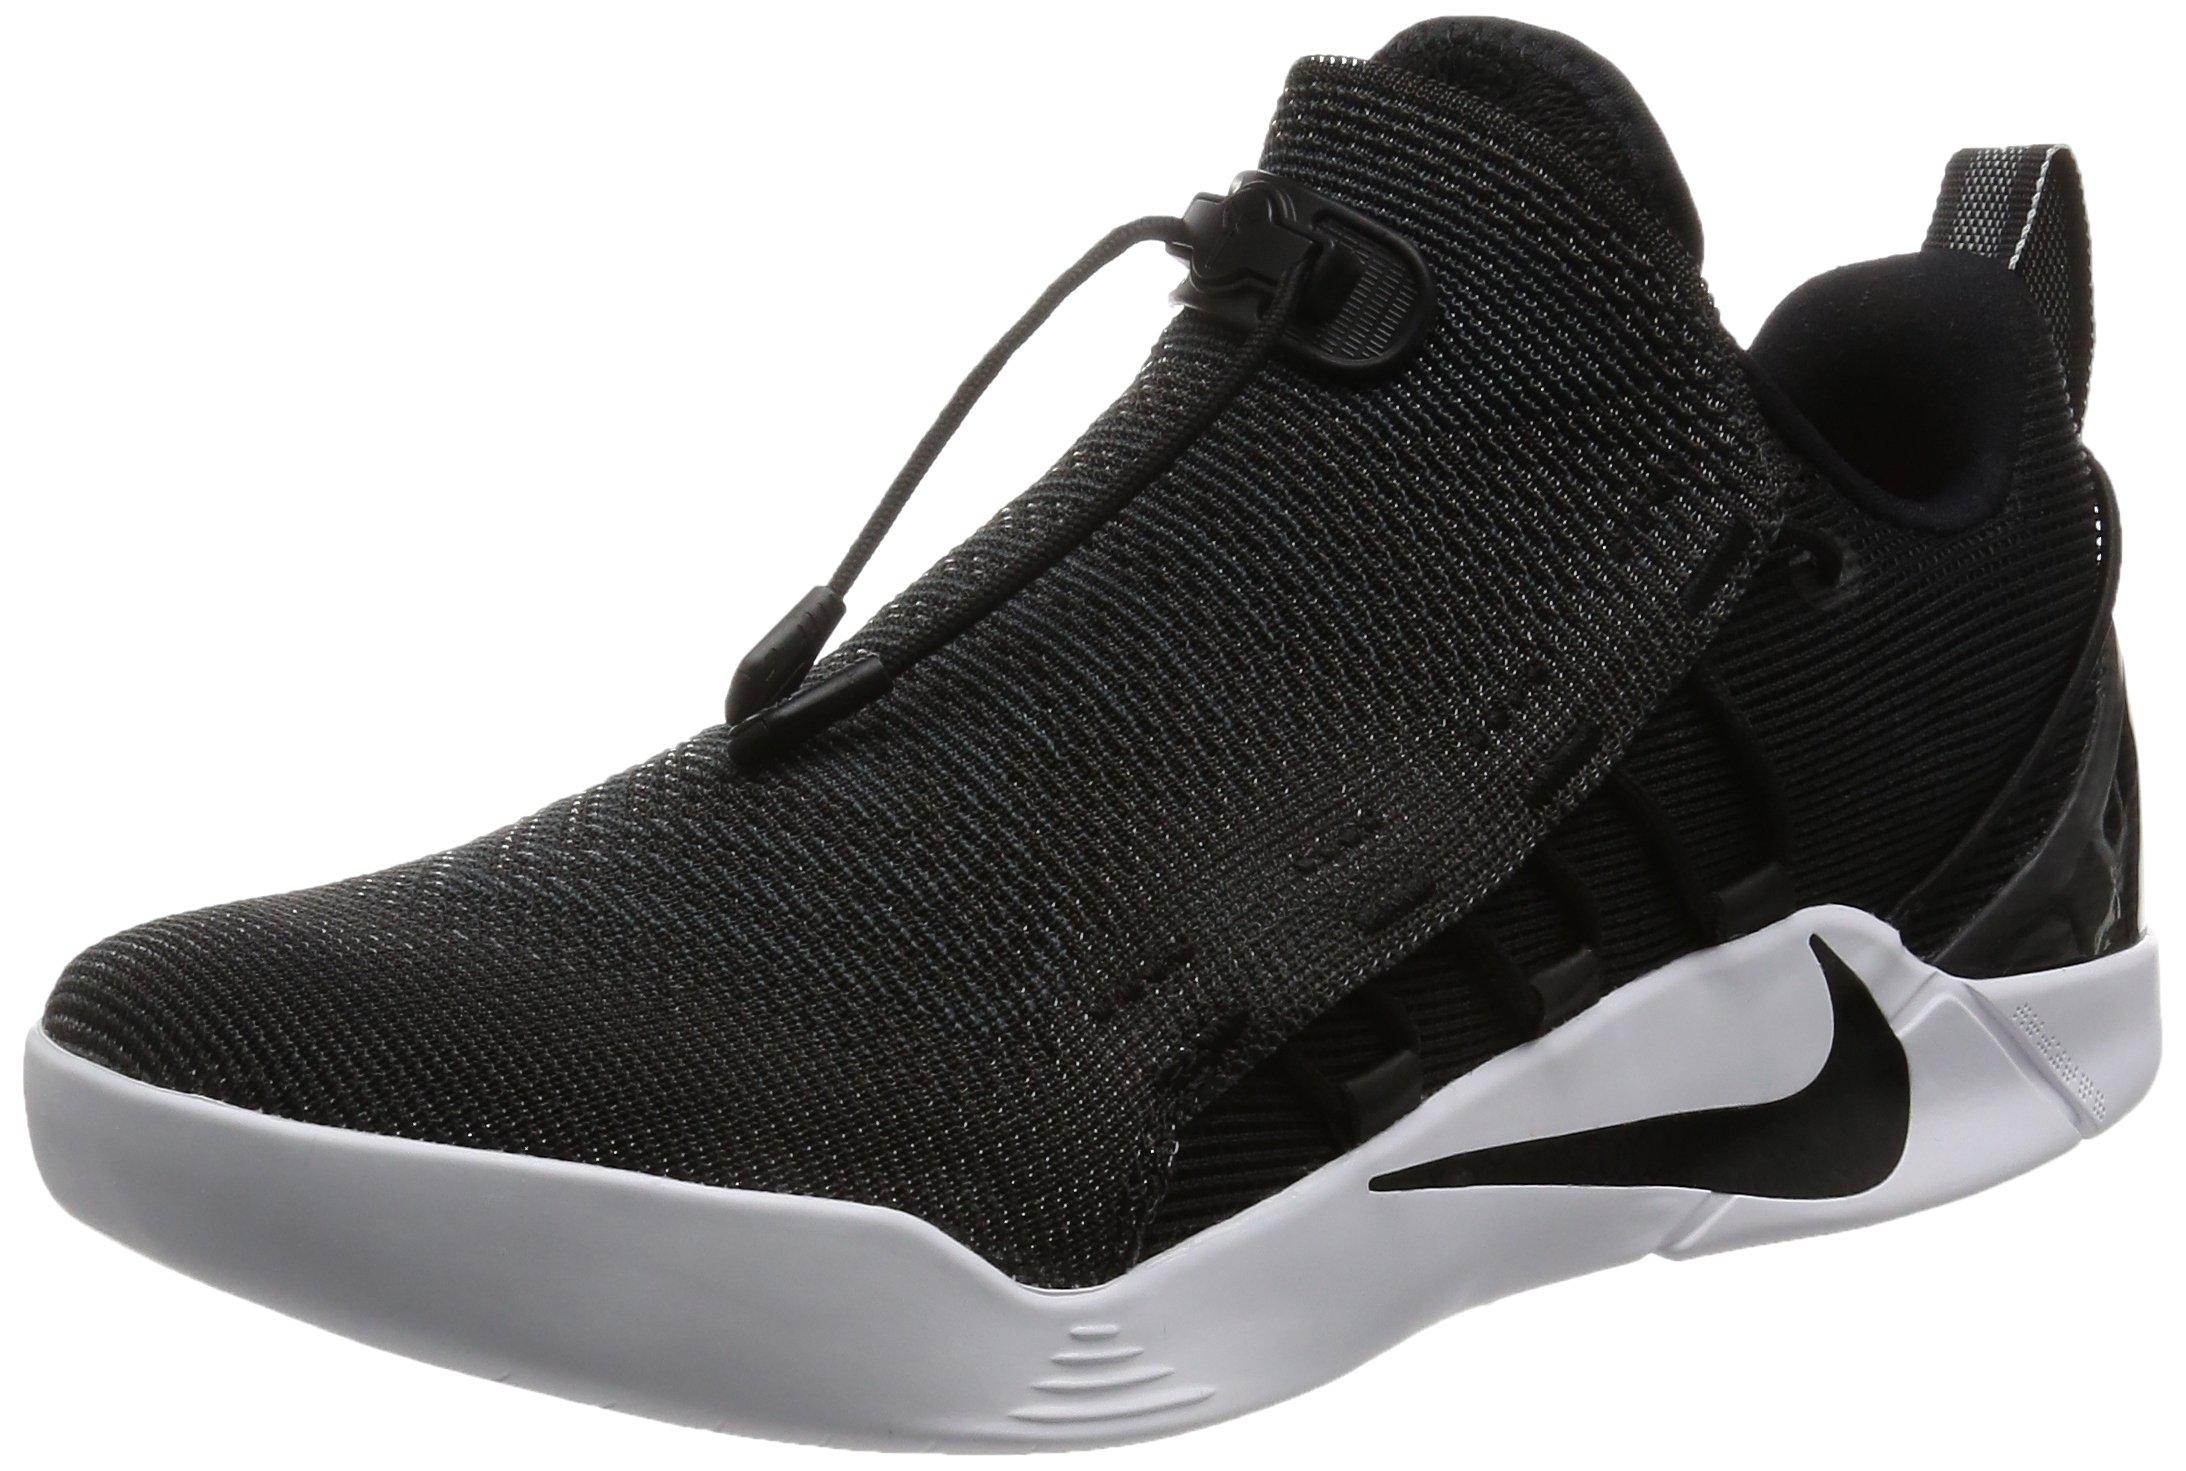 buy online baae9 8754a ... 360 Yellow QS Strike Mamba Lakers AQ1087 700 Sz 7.5-15.  149.99. Nike  Mens Kobe A.D. NXT Basketball Shoes (10.5, Black Metallic Silver-white